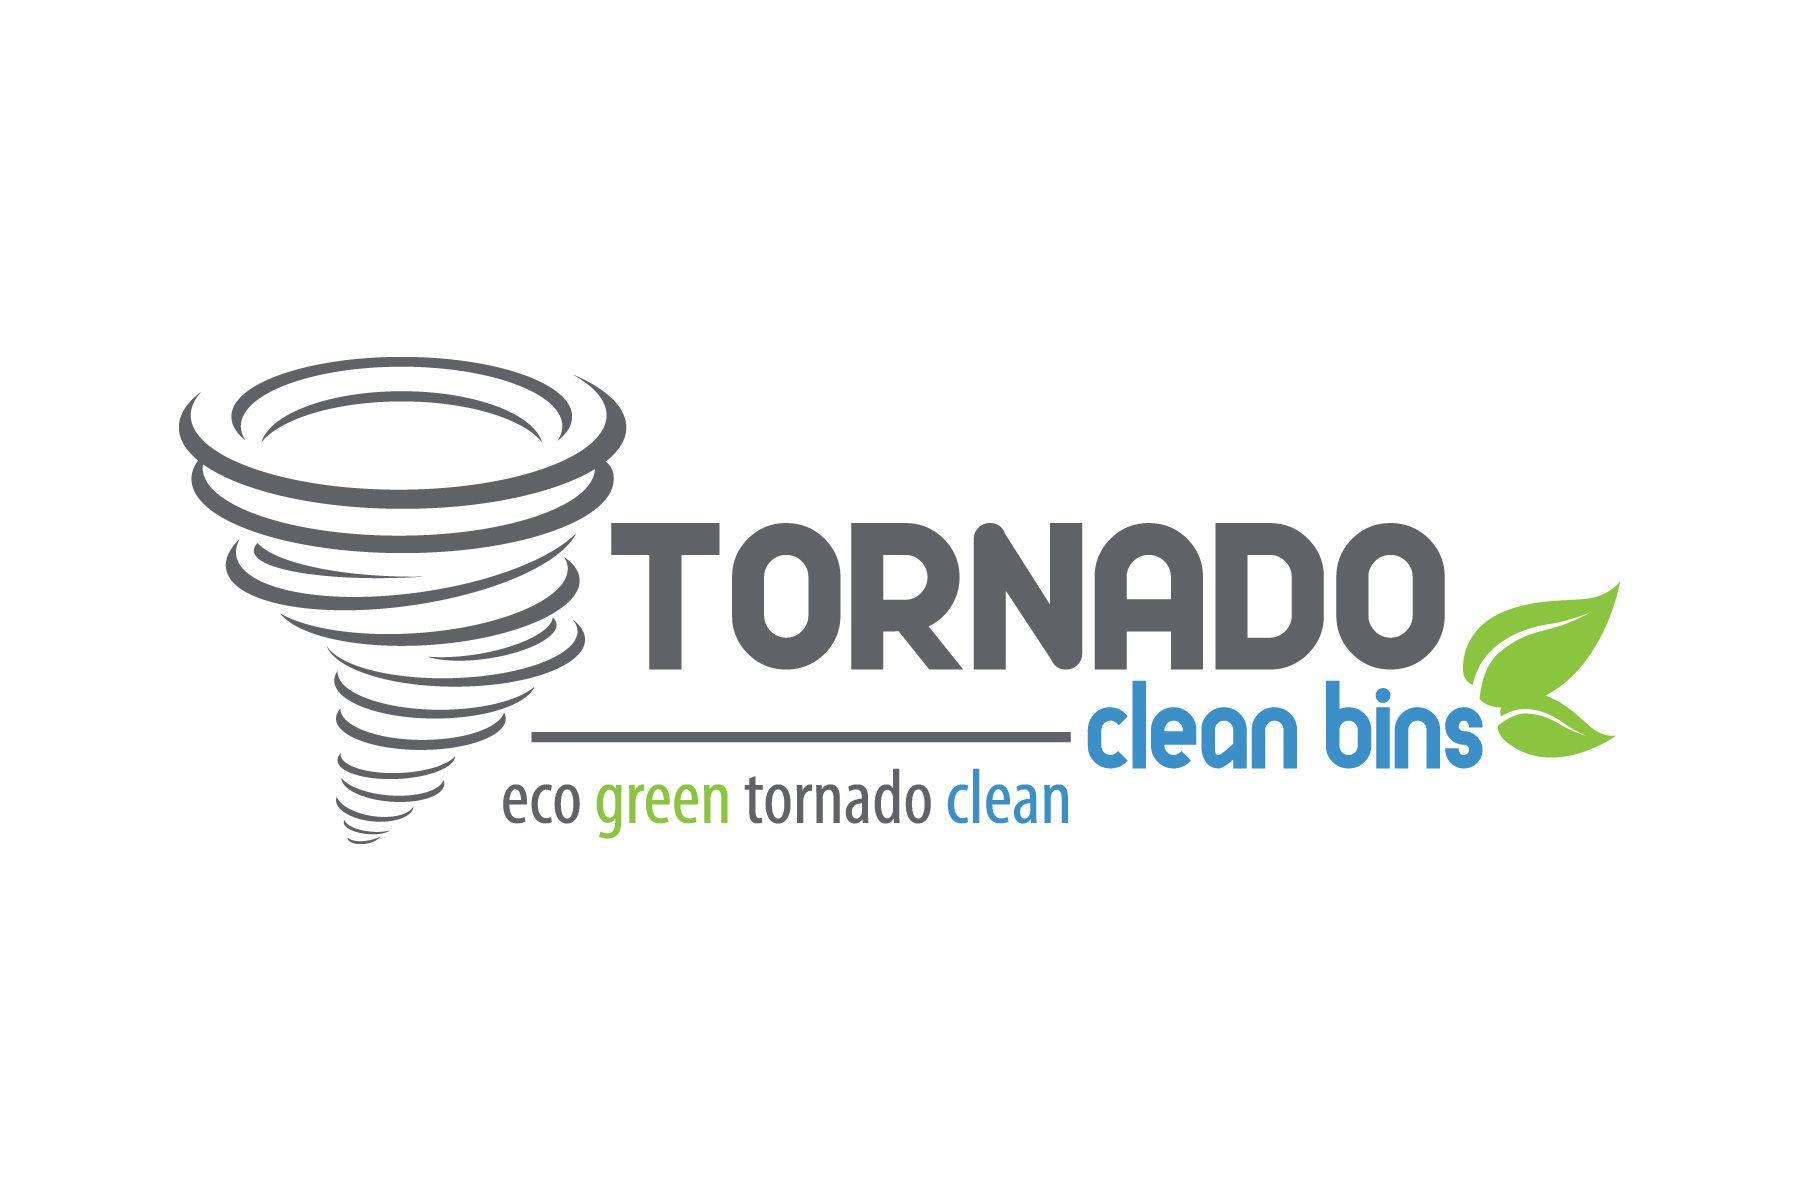 TornadoCleanBinsLogo